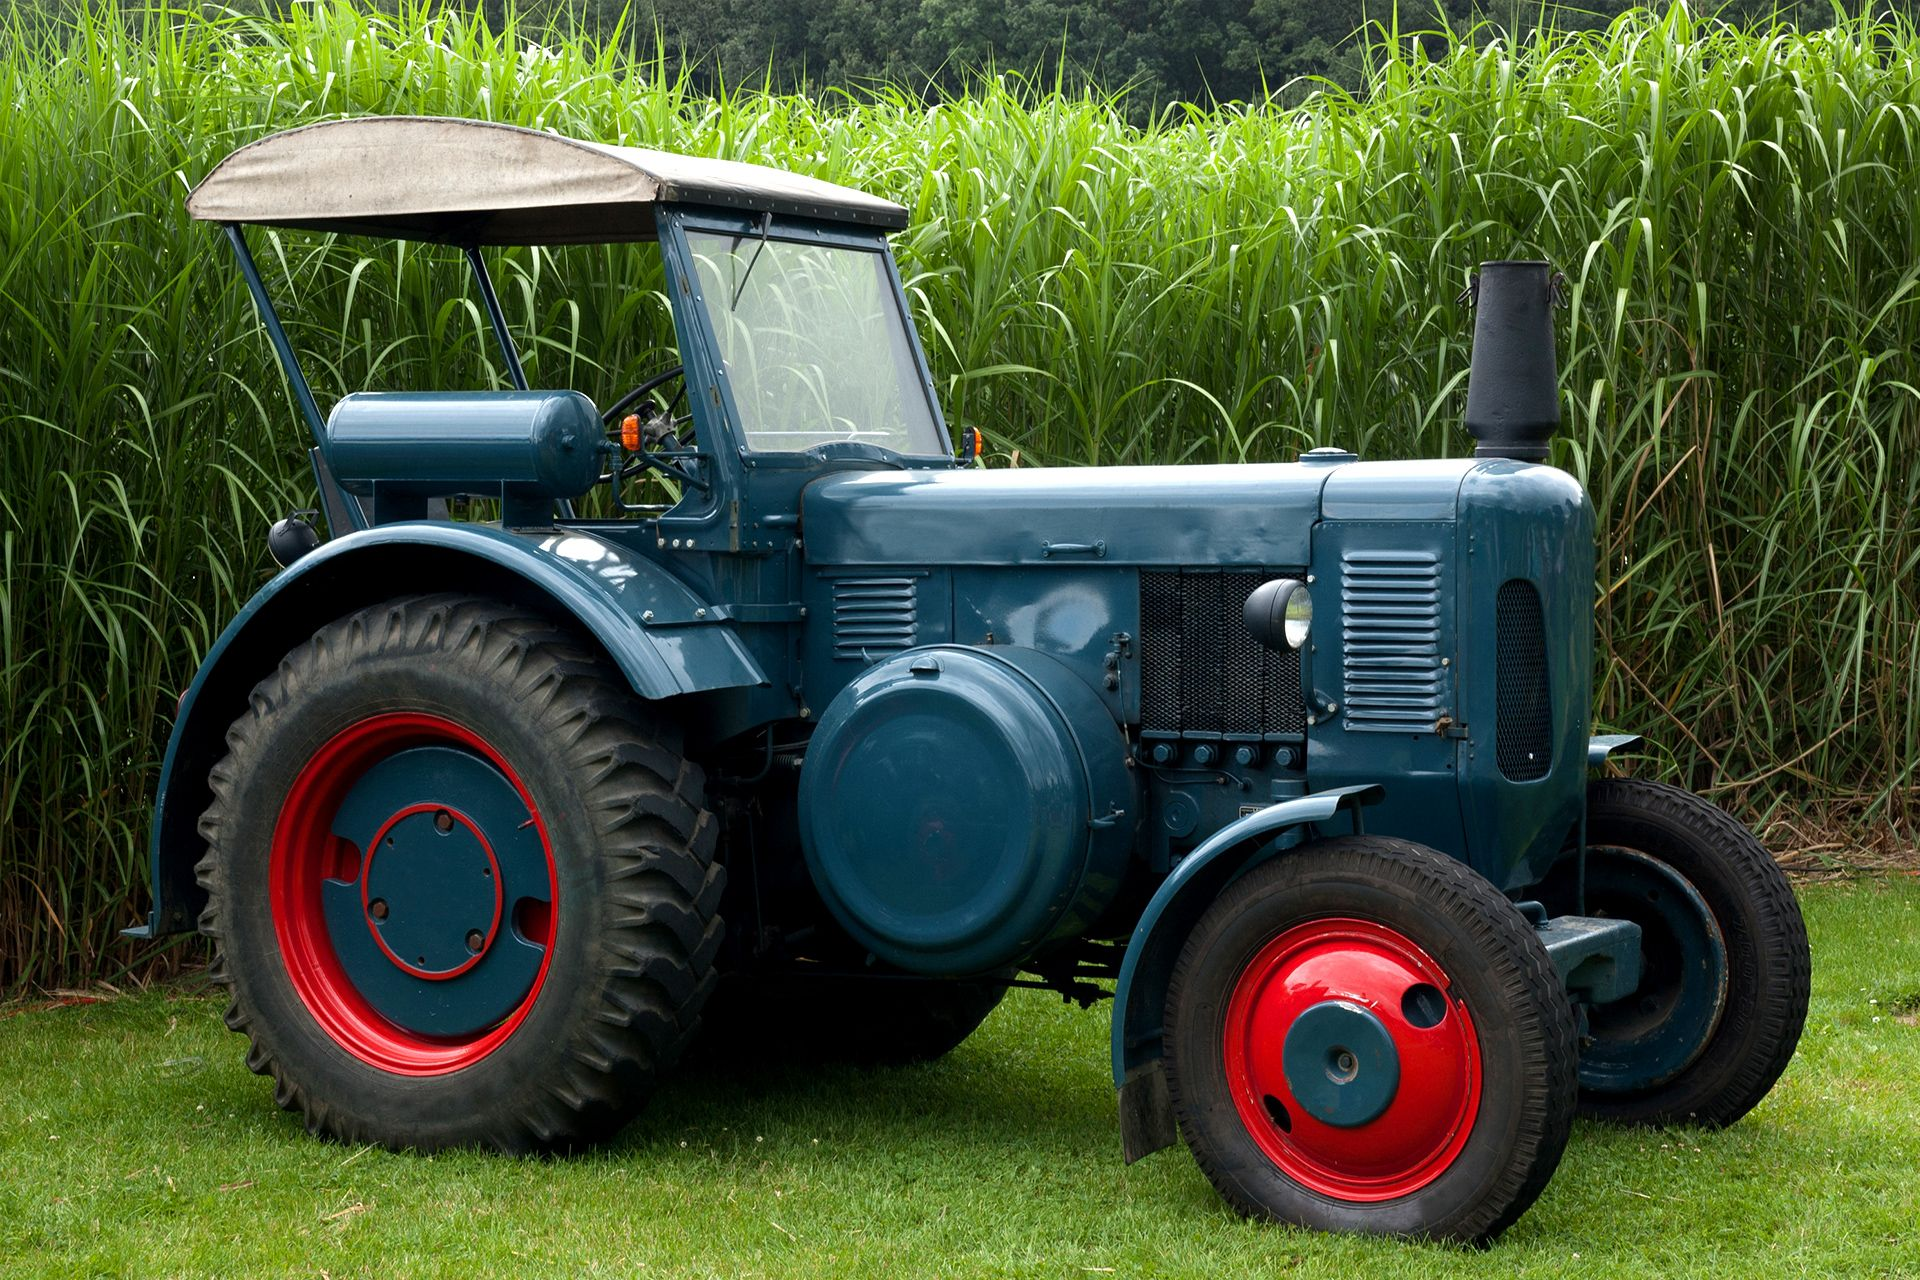 lustige traktor bilder